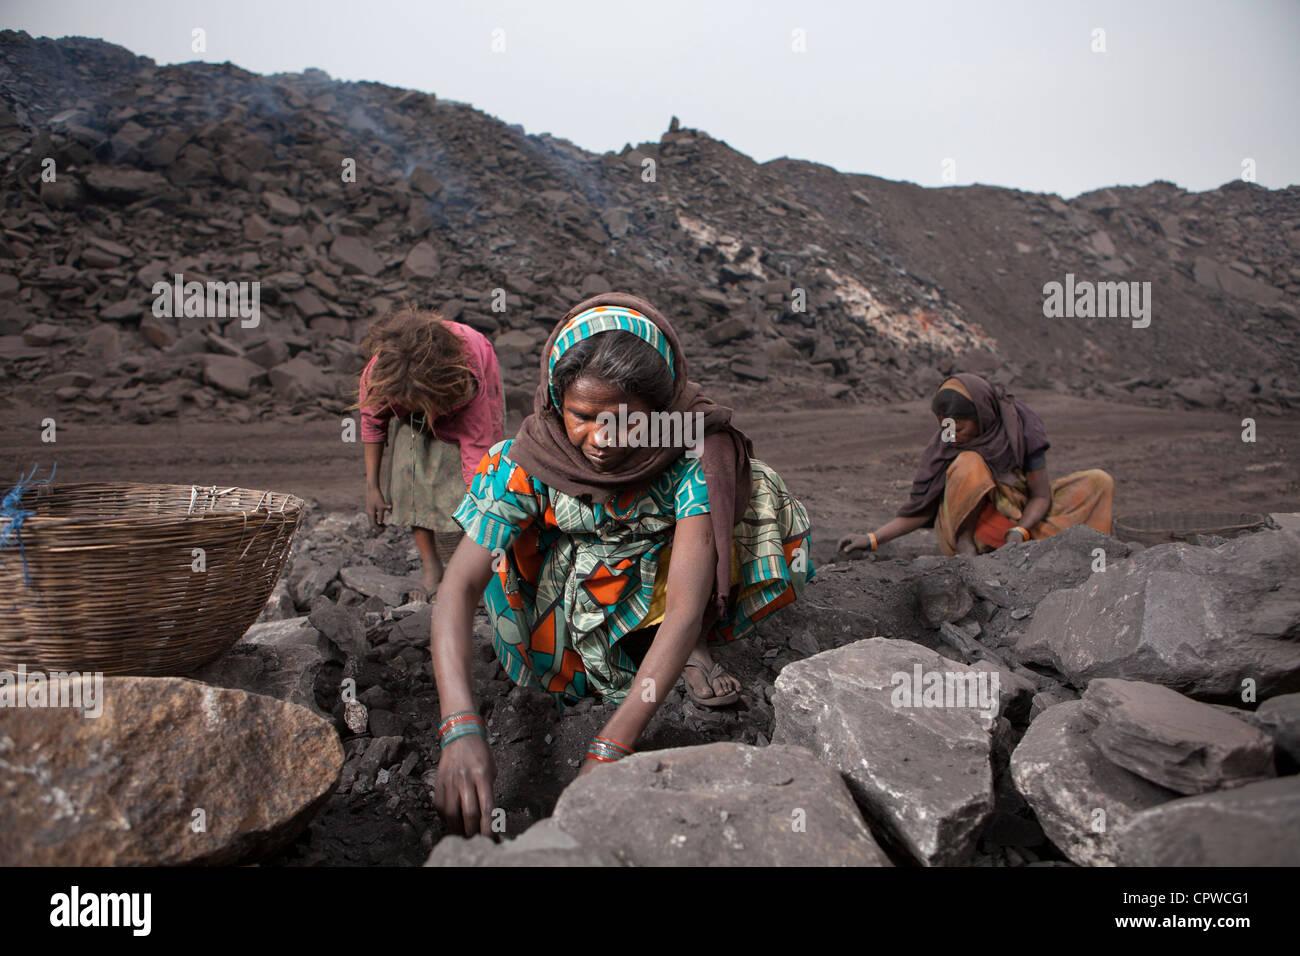 coal township women Meet single women in coal township pa online & chat in the forums dhu is a 100% free dating site to find single women in coal township.